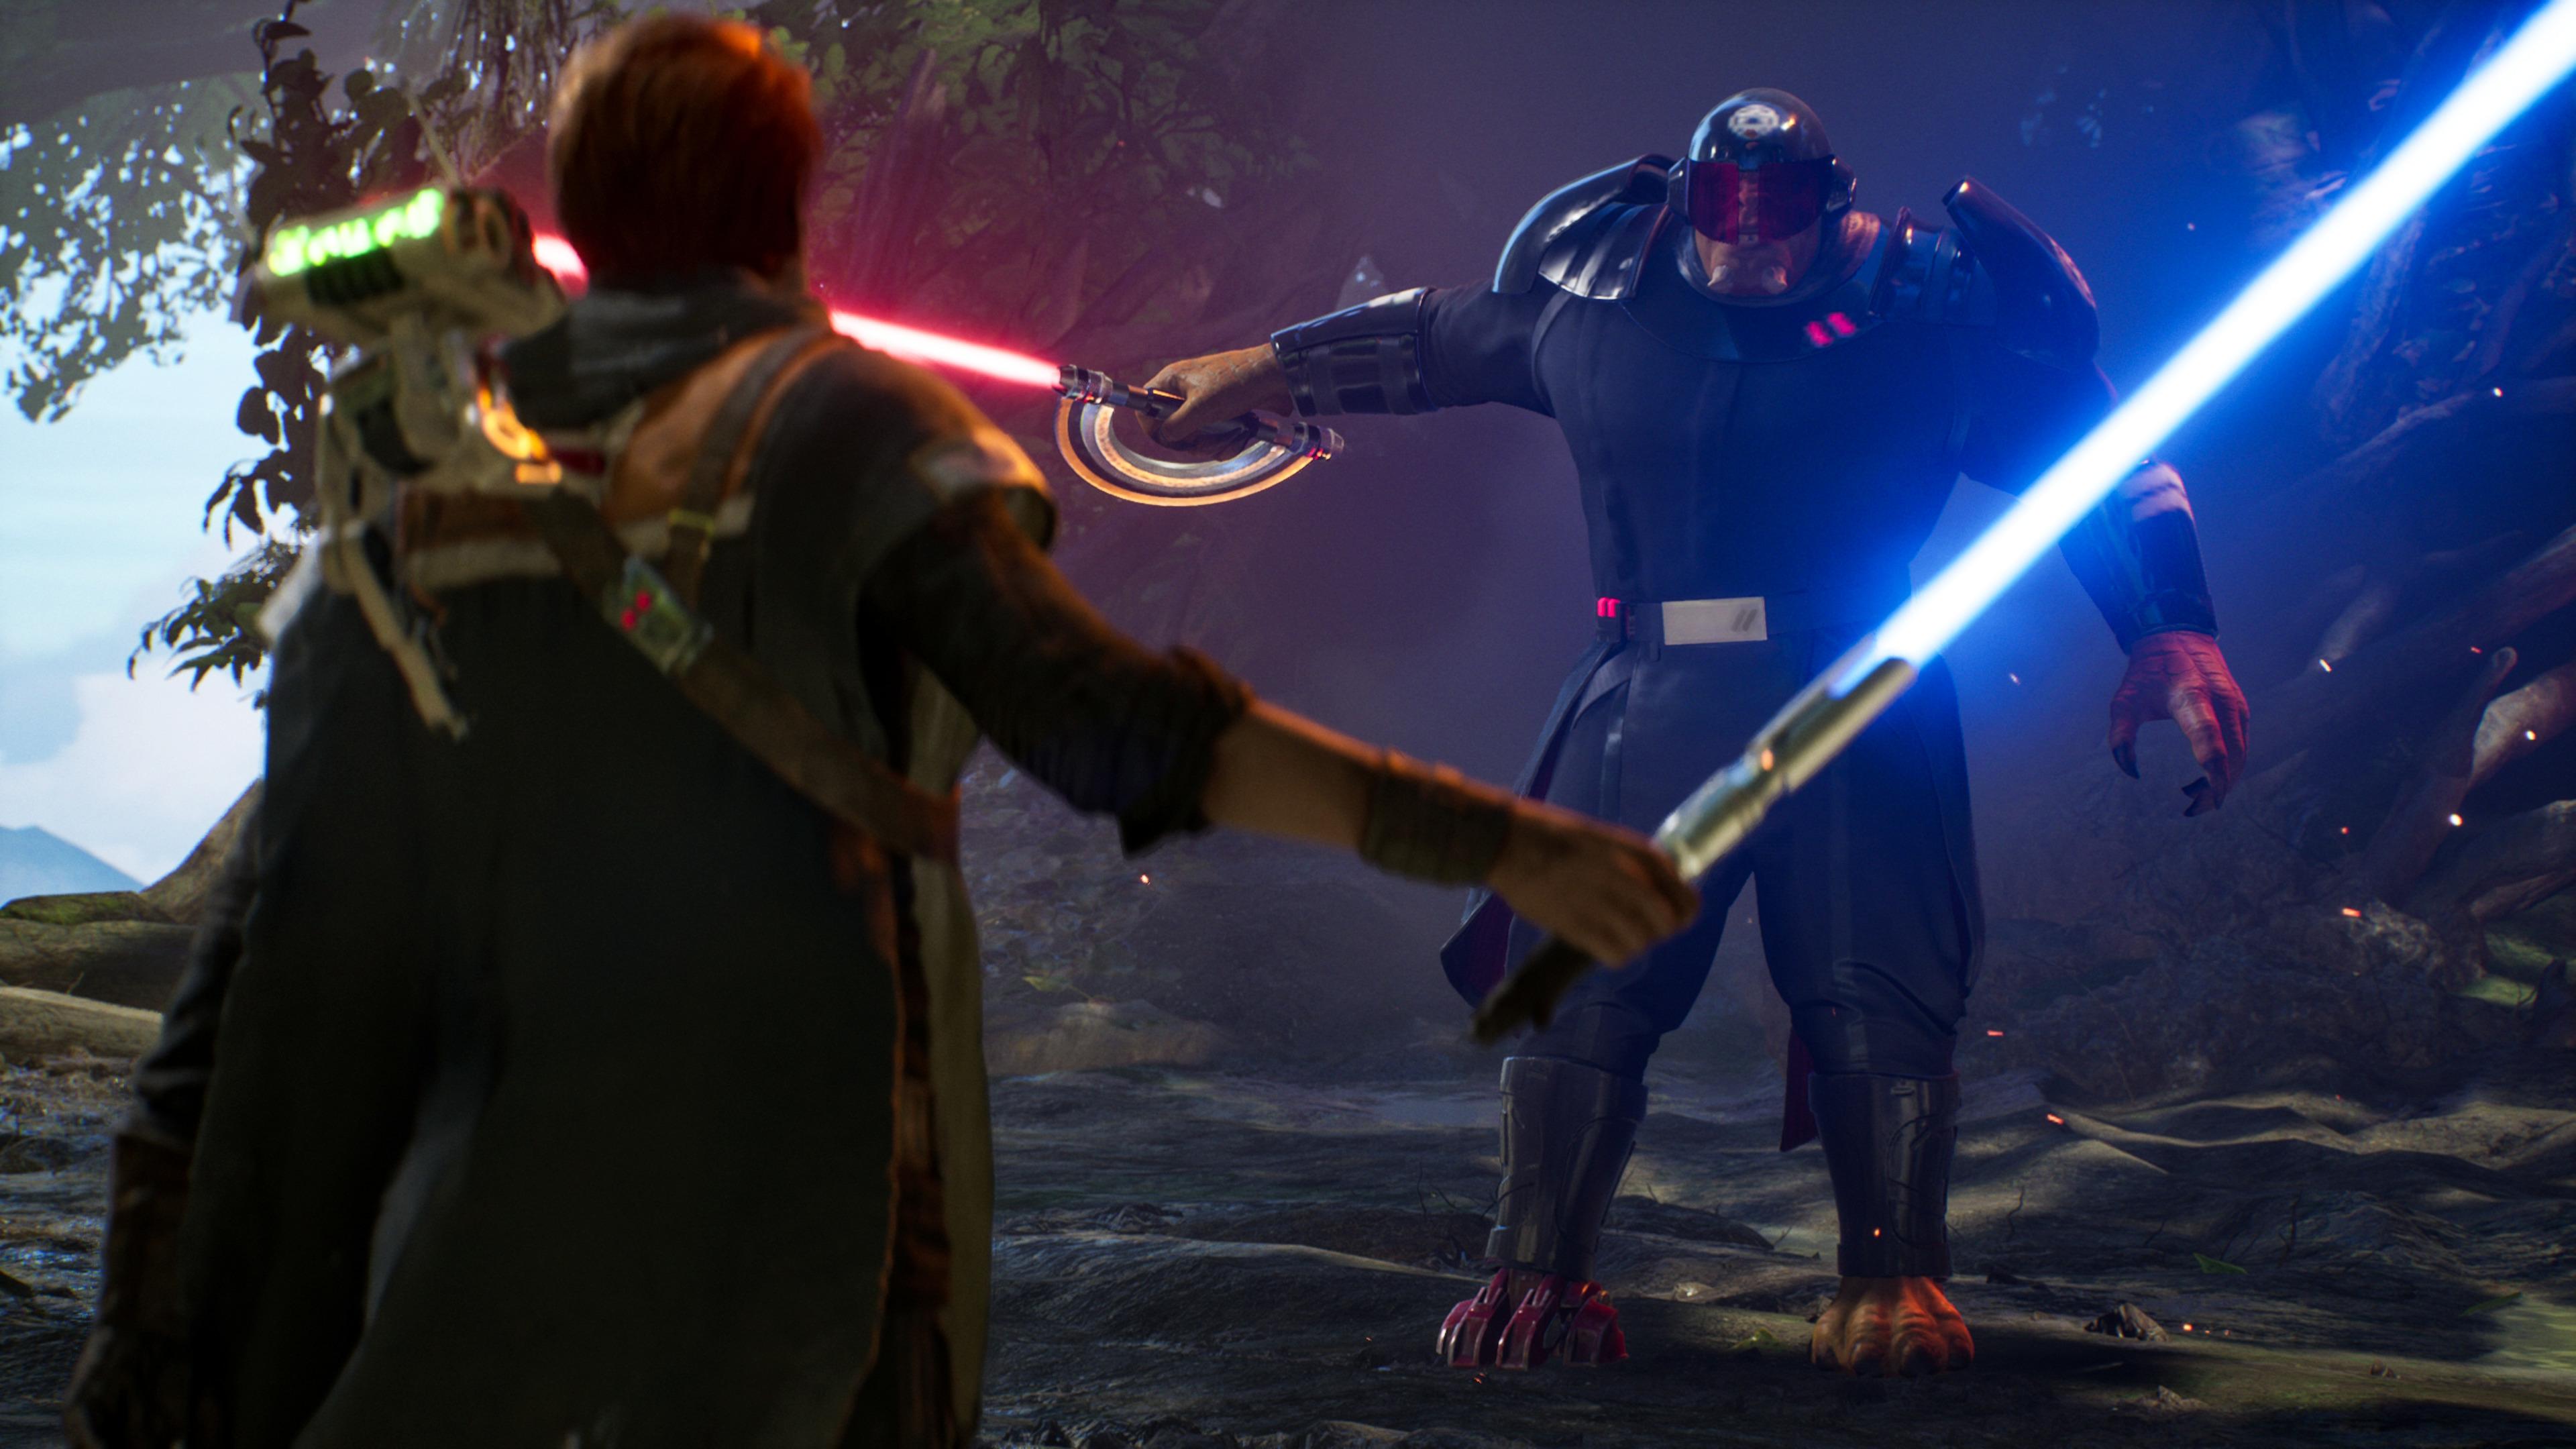 Star Wars Jedi Lightsaber Cal Kestis 3840x2160